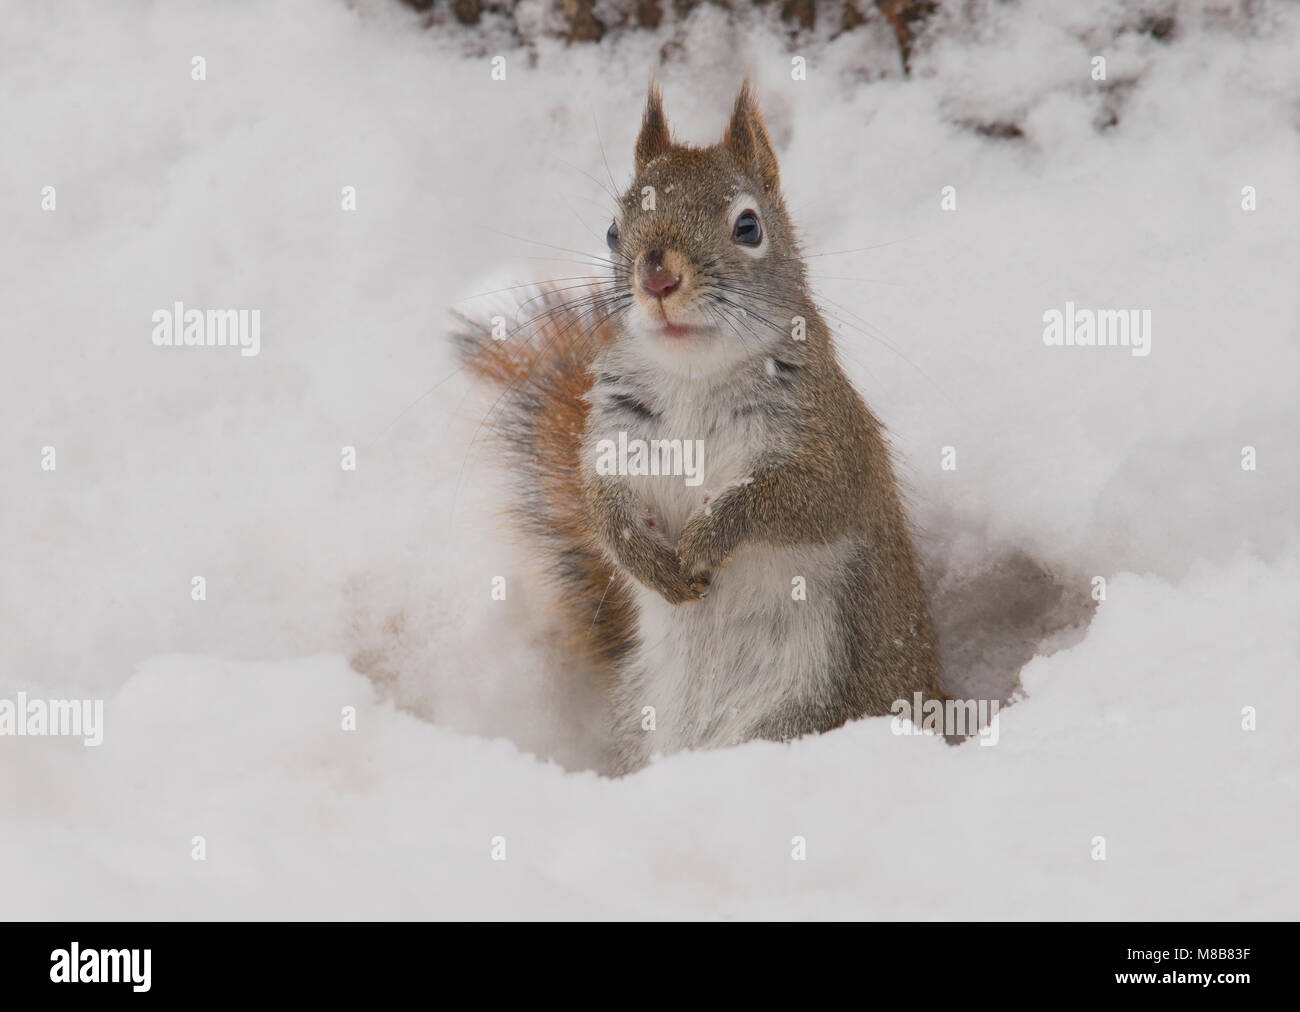 American Red Squirrel (Tamiasciurus hudsonicus), Winter, E USA, by Skip Moody/Dembinsky Photo Assoc - Stock Image